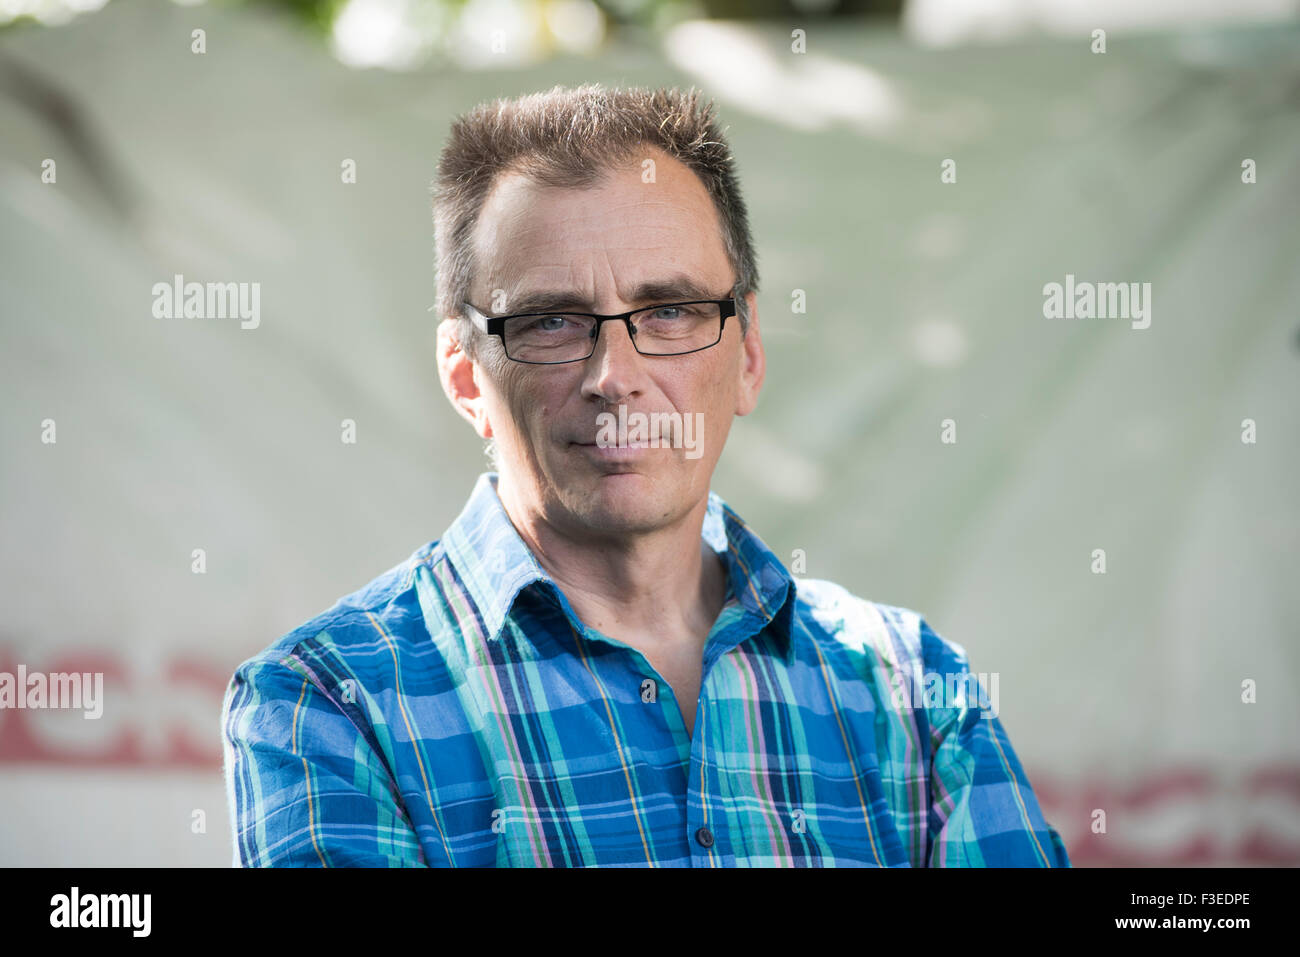 Cinematographer, Film-maker, speaker and adventurer Keith Partridge. - Stock Image